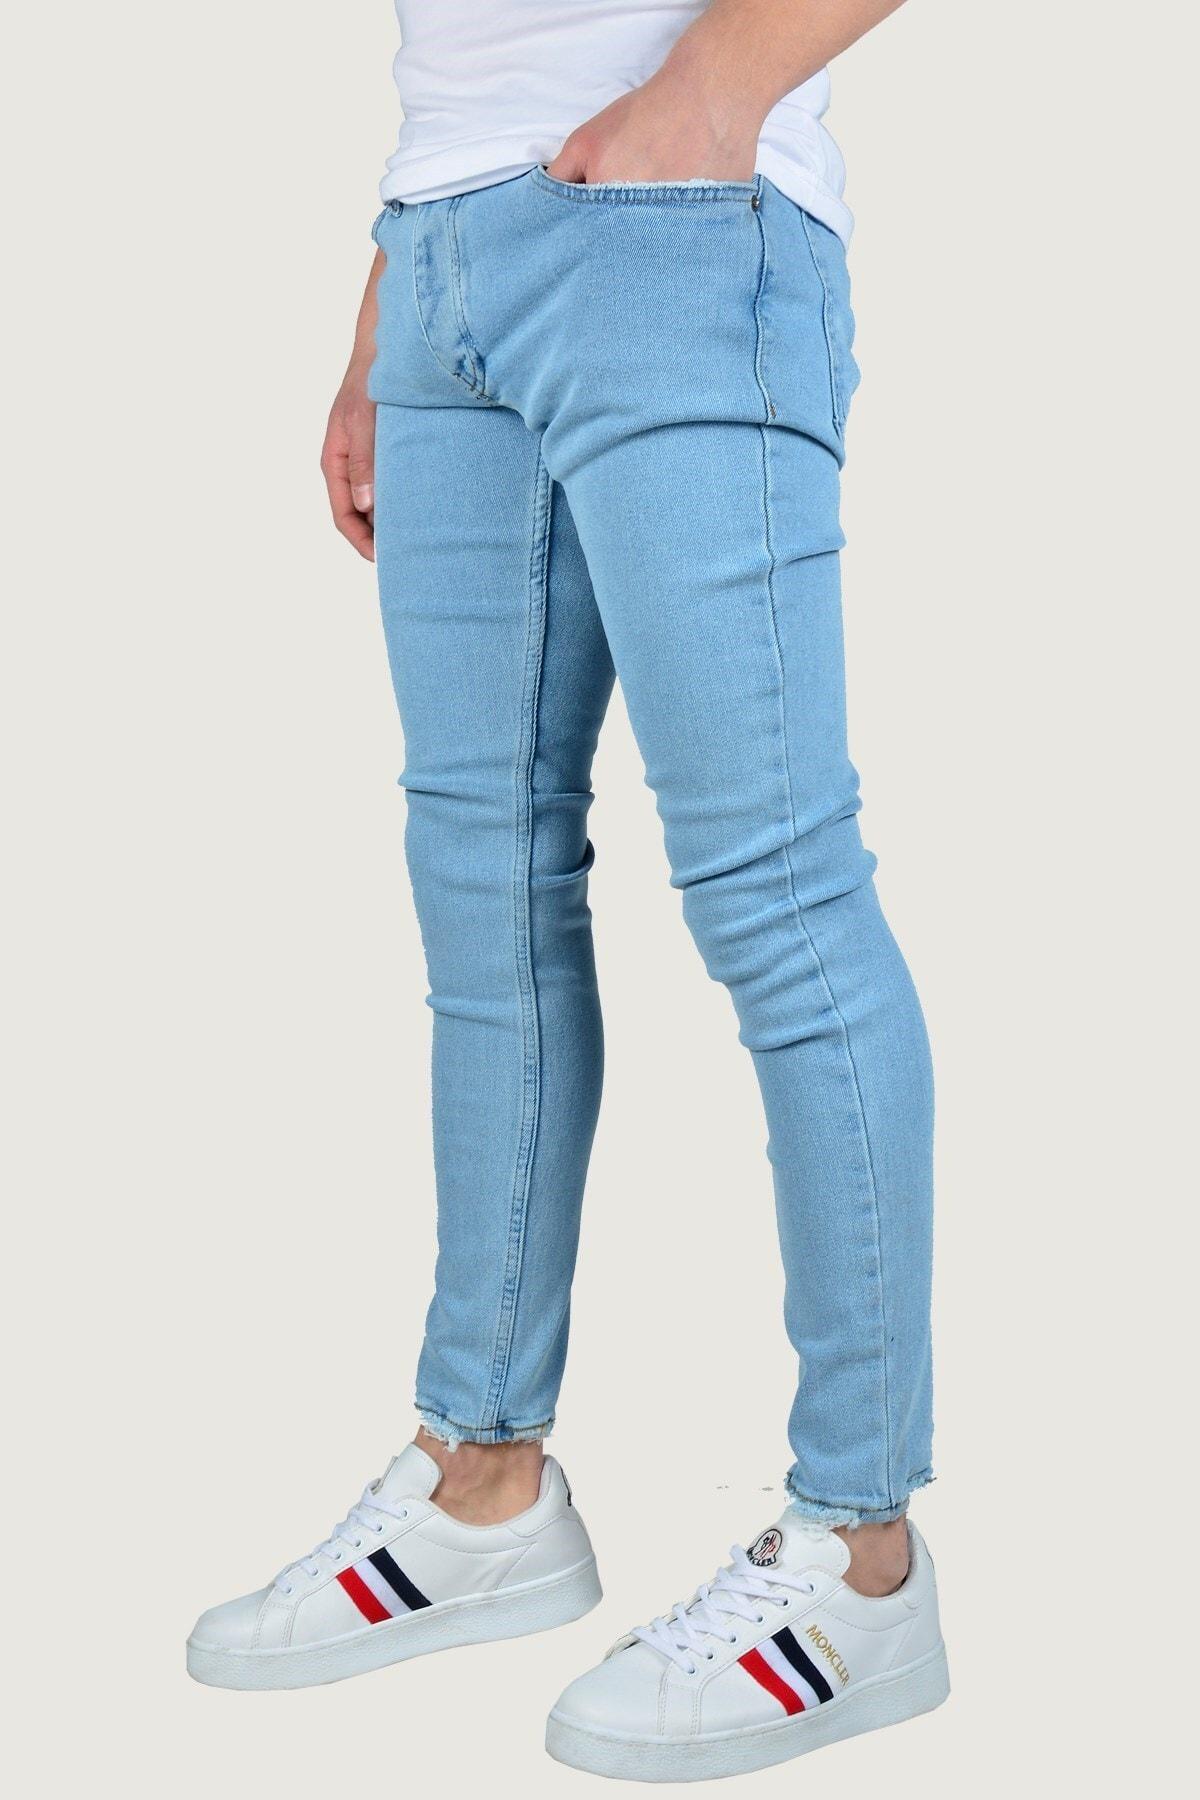 Terapi Men Erkek Kot Pantolon 8K-2100306-004-1 Buz Mavisi 1